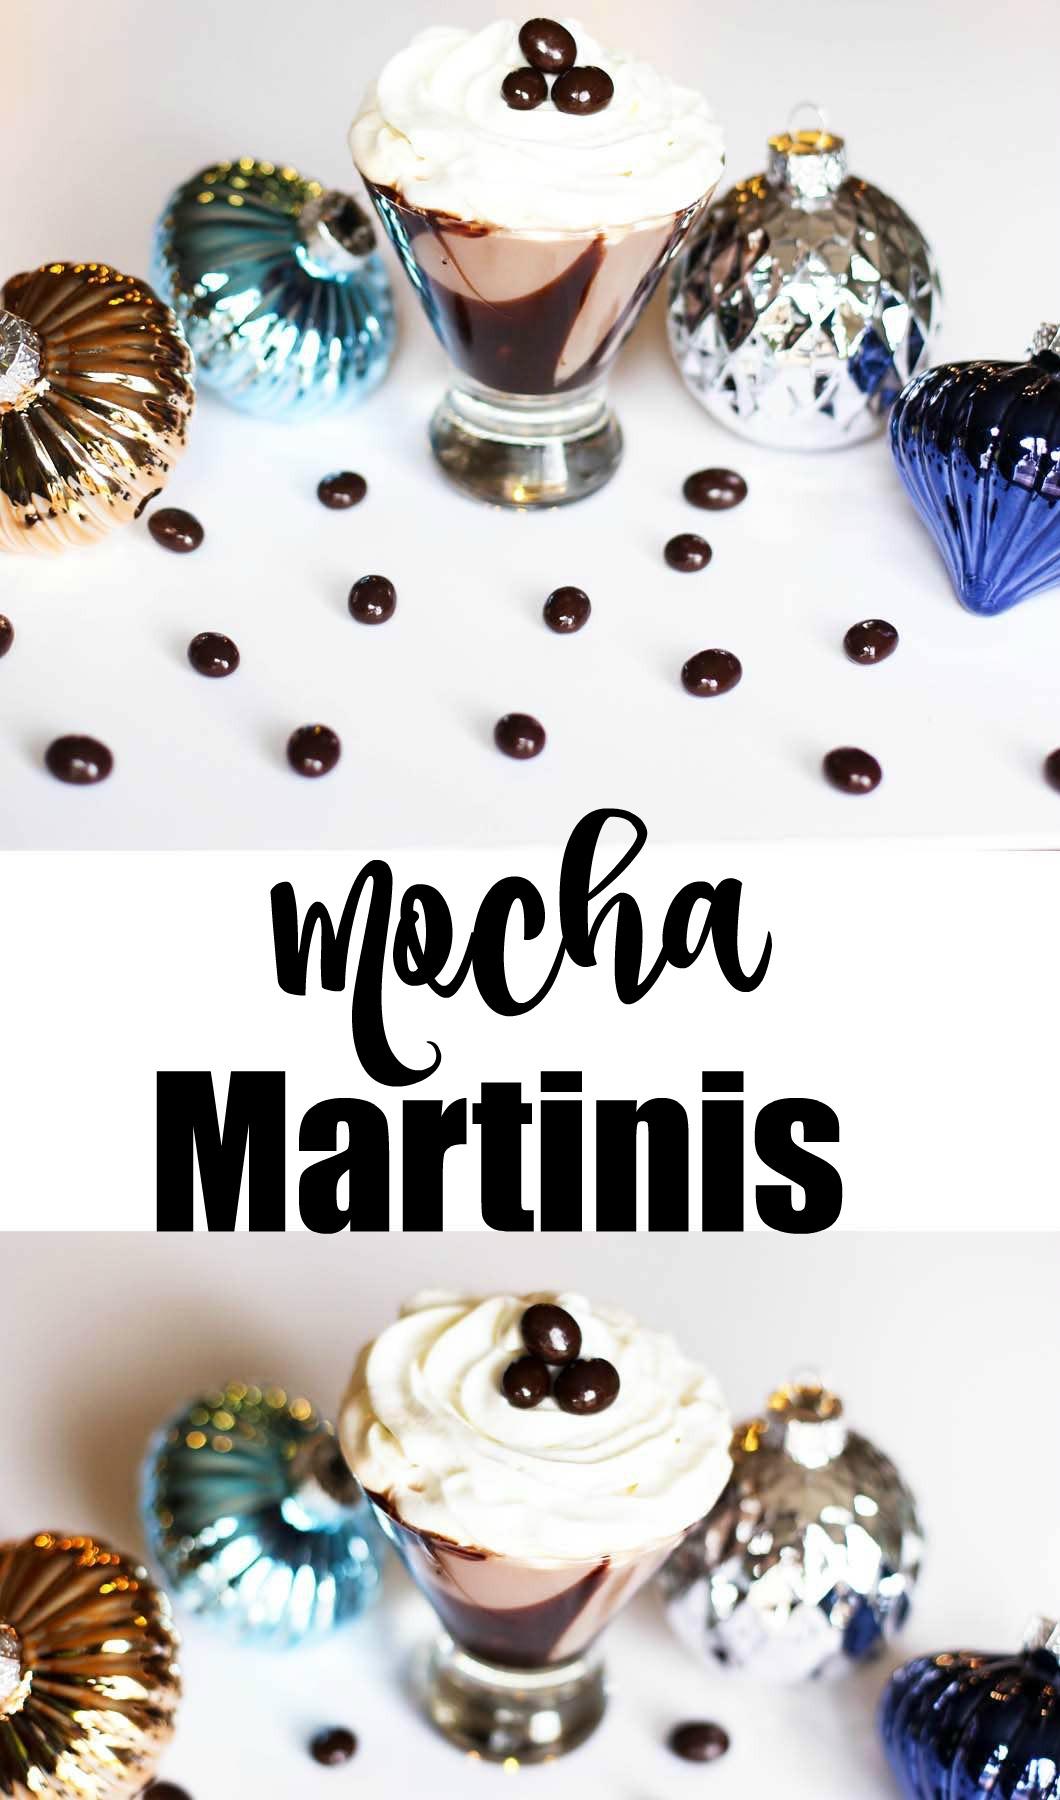 Mocha Martinis